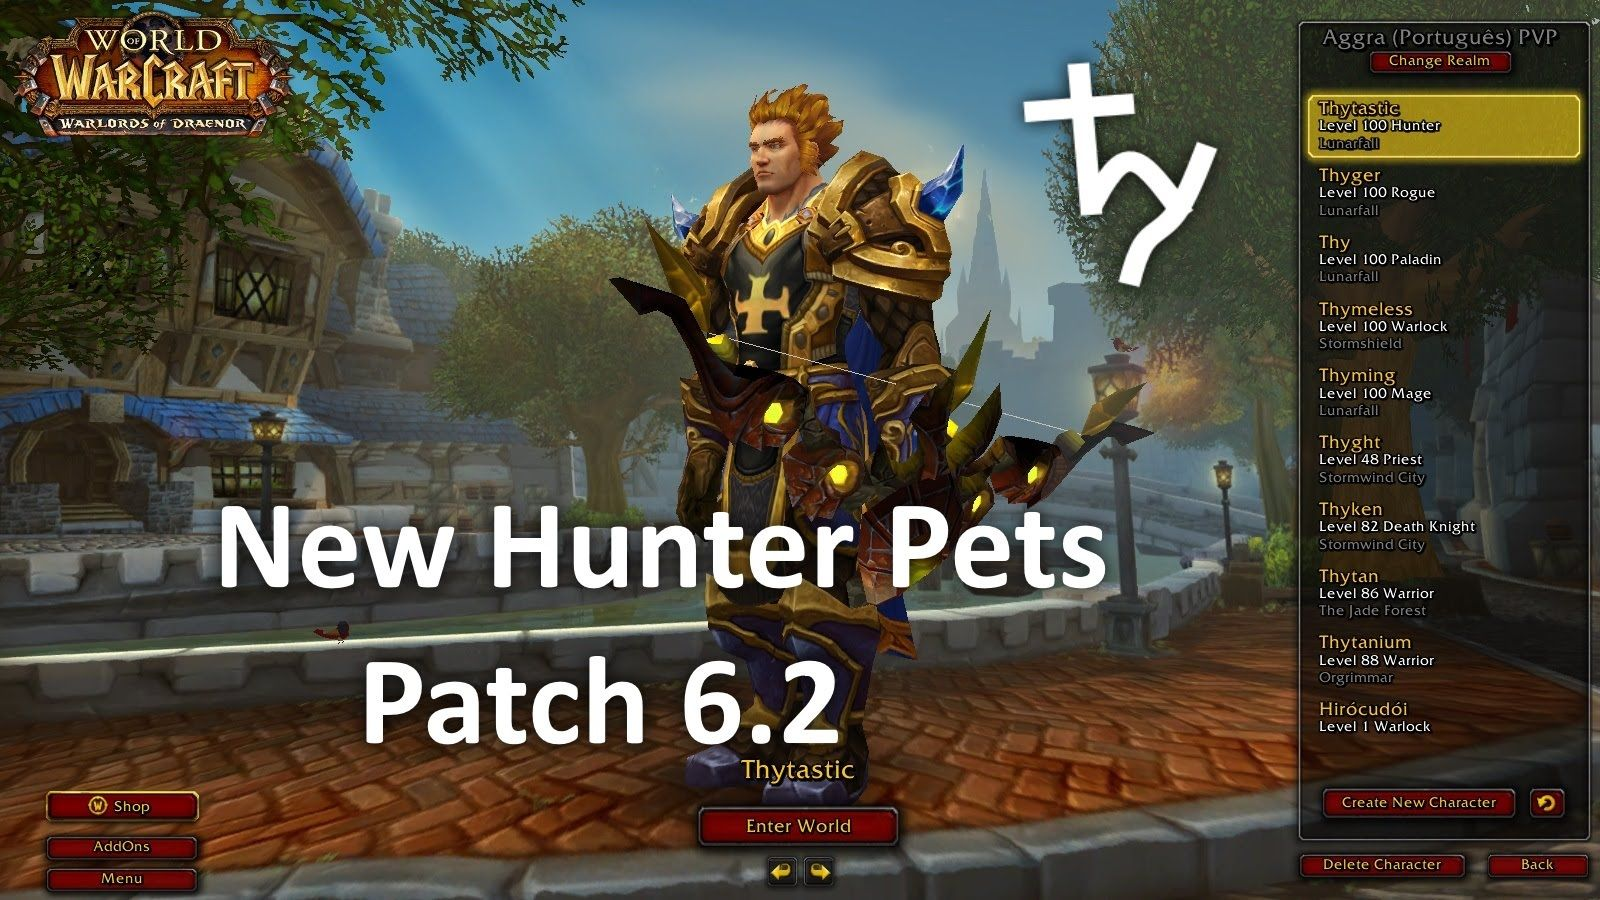 Cool New Hunter Pets Patch 6 2 World Of Warcraft News Warcraft World Of Warcraft